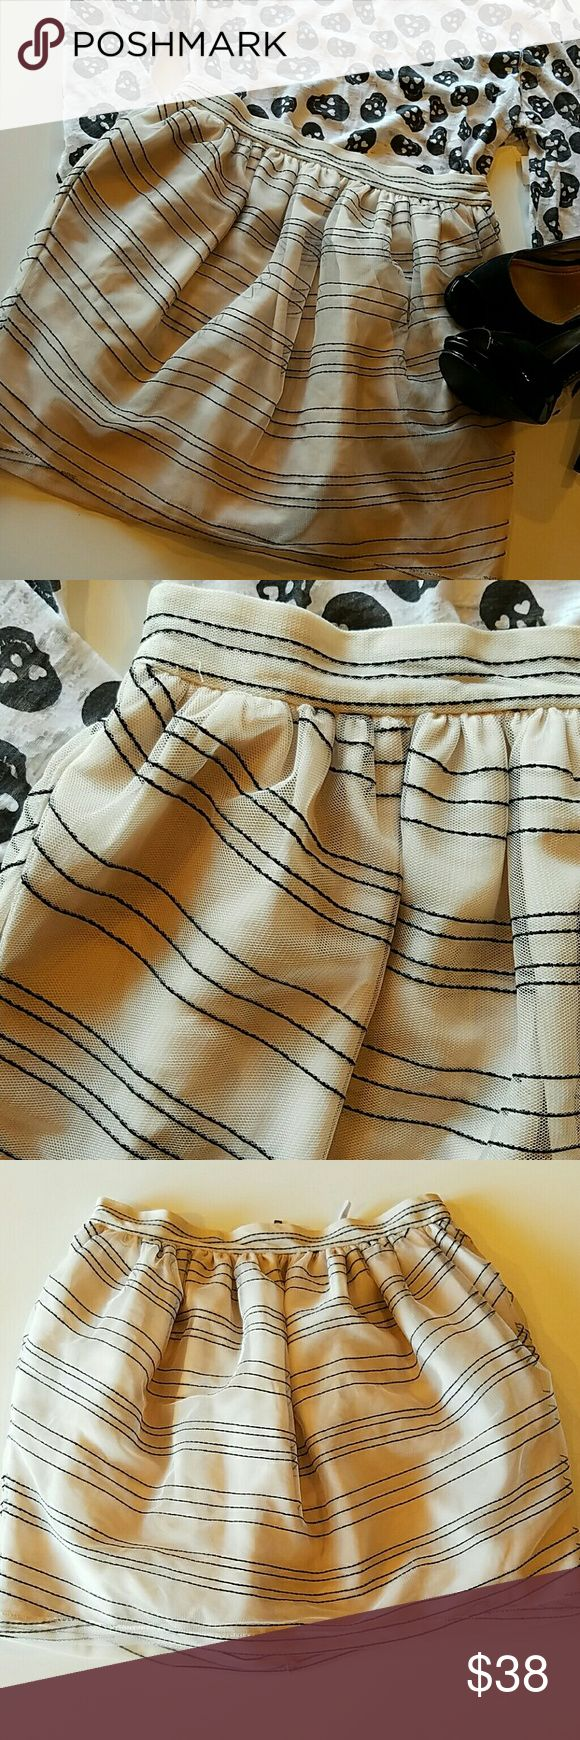 "BCBGeneration skirt Adorable tulle skirt, NEW, never worn.Black stripes on ivory color tulle, fully lined. Inseam POCKETS!  Waist 13.5"", lenght 15"" BCBGeneration Skirts"